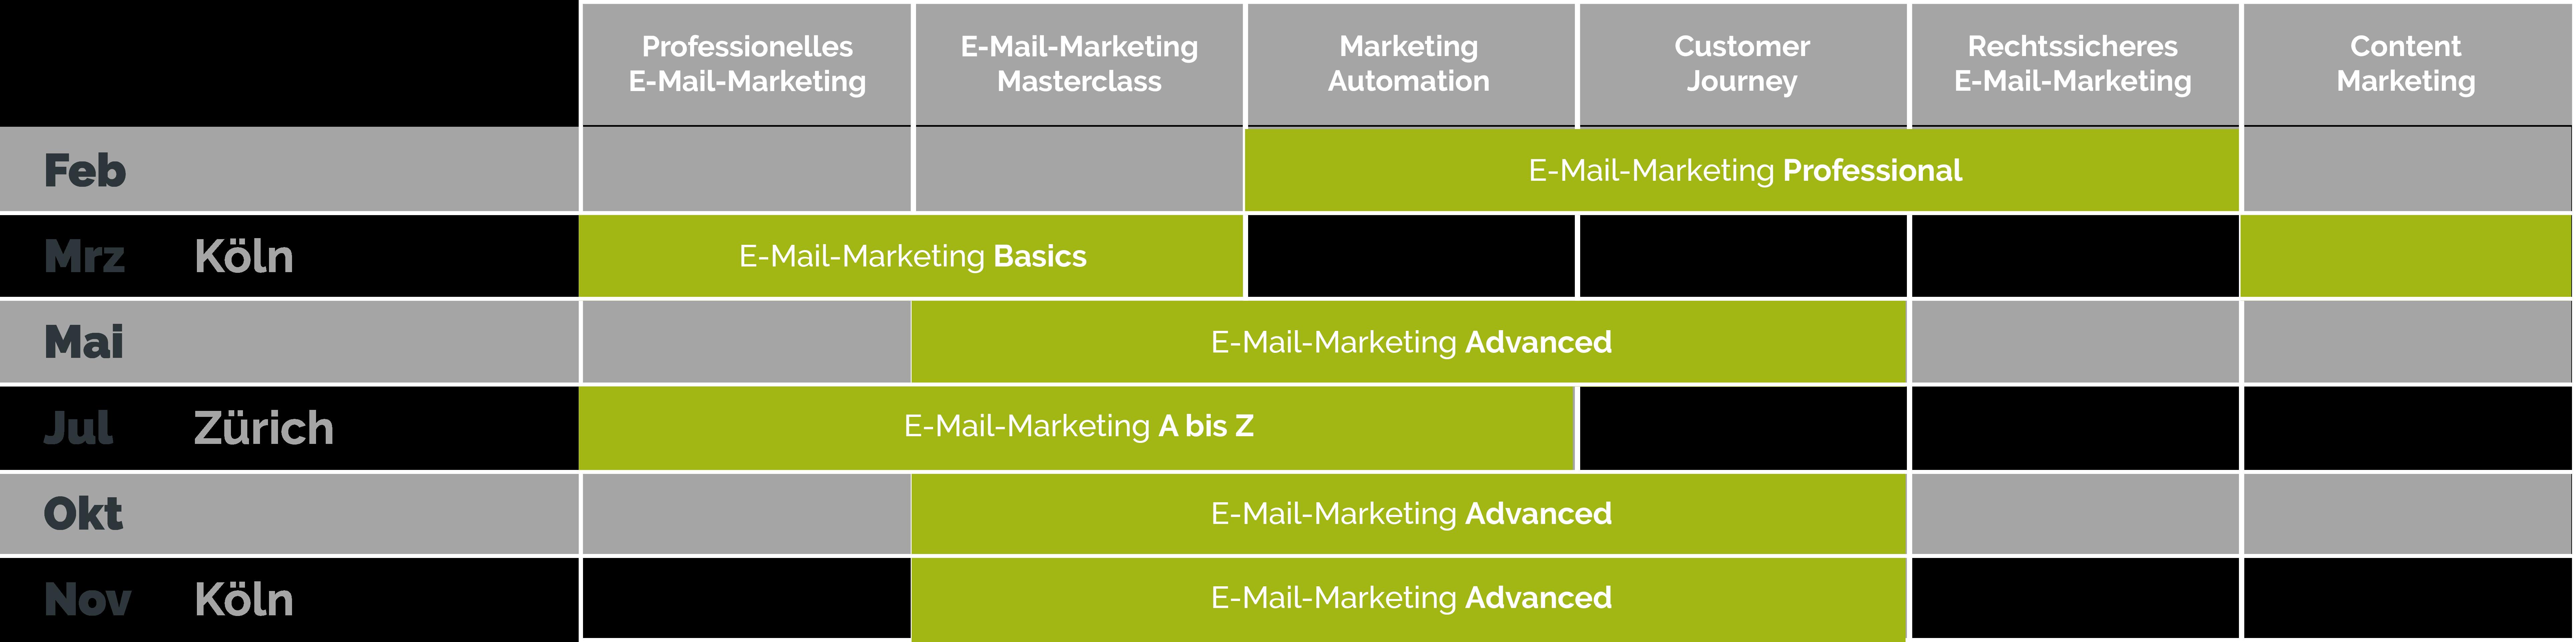 e mail marketing seminare bundleangebote - Unsere Seminar-Pakete